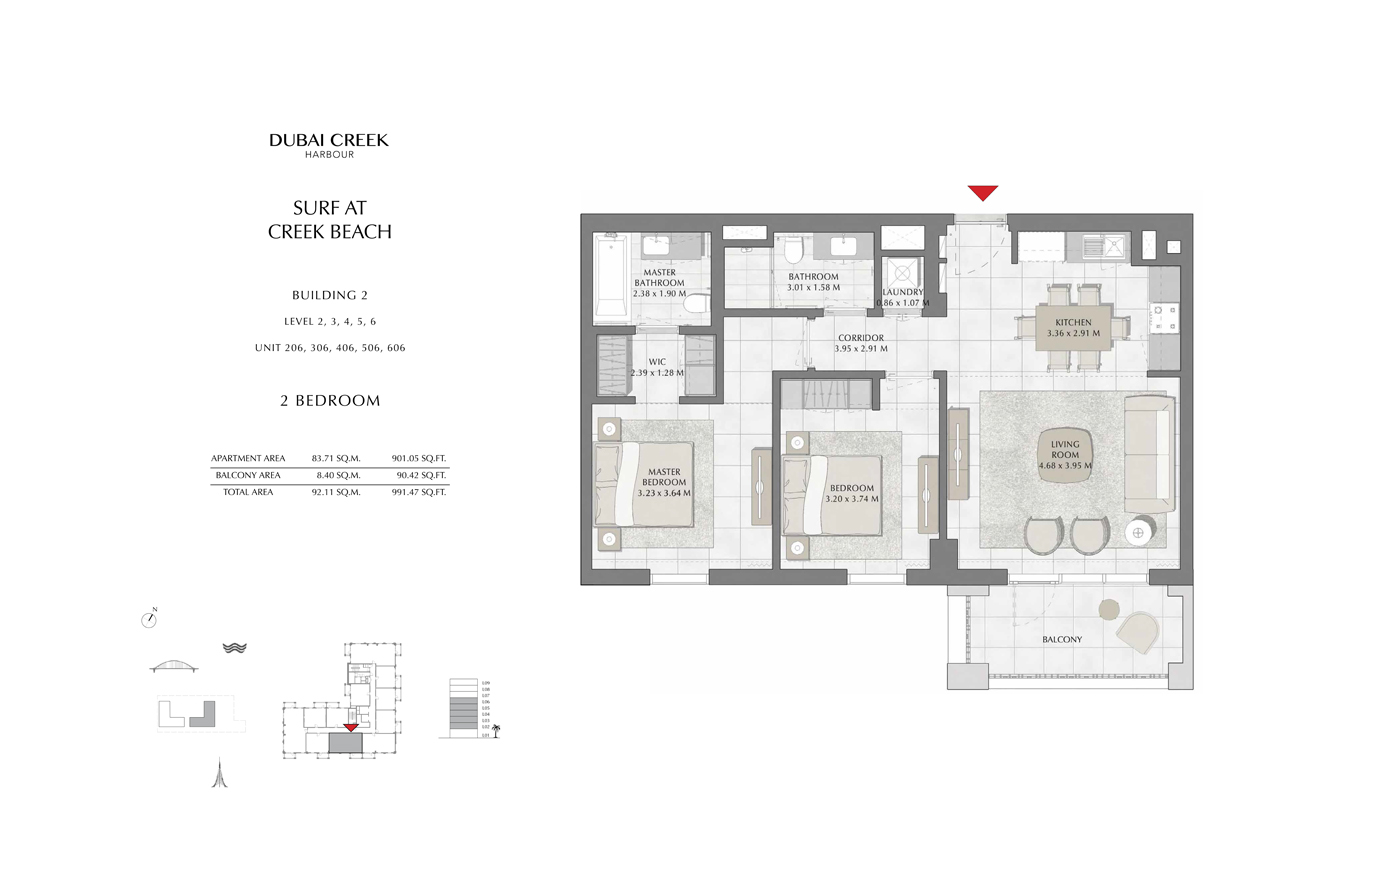 Building 2, 2 Bedroom Level 2, 3, 4, 5, 6, Size 991 Sq Ft